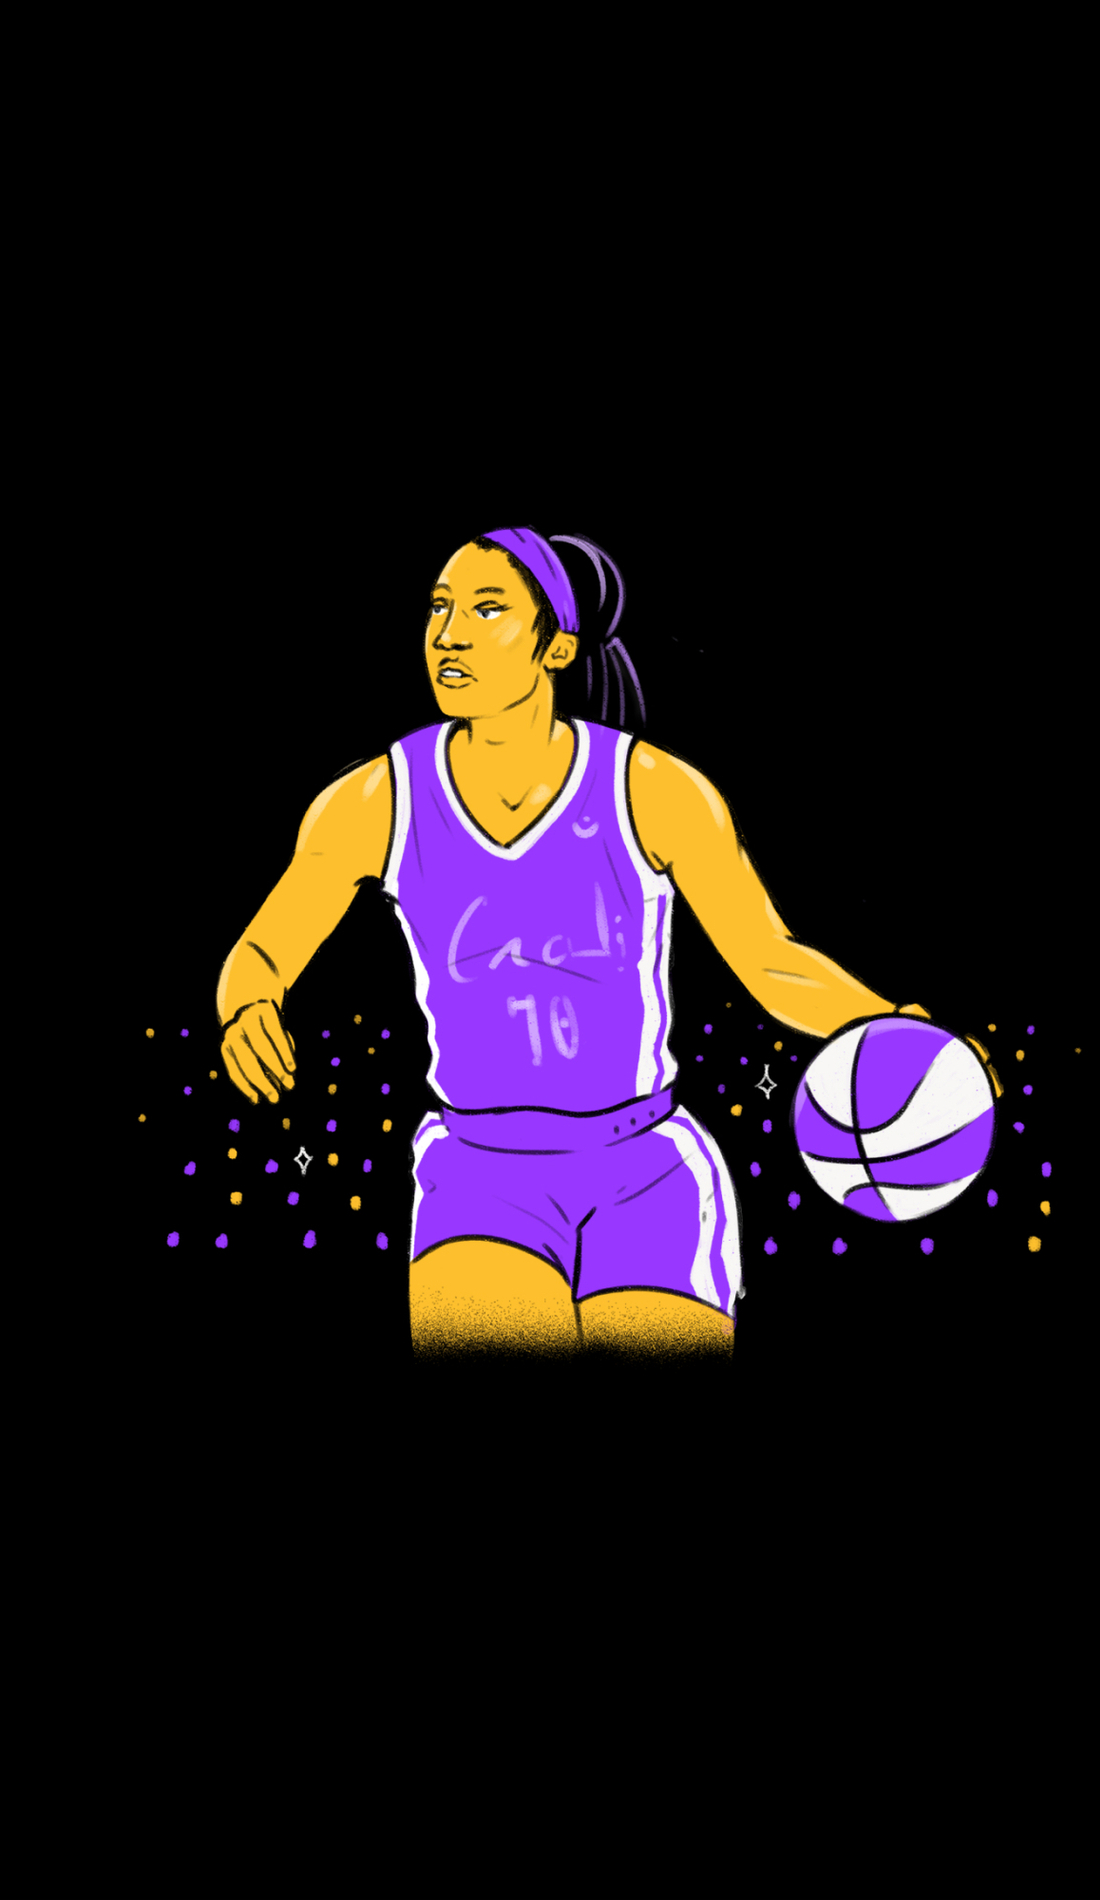 A Illinois Fighting Illini Womens Basketball live event